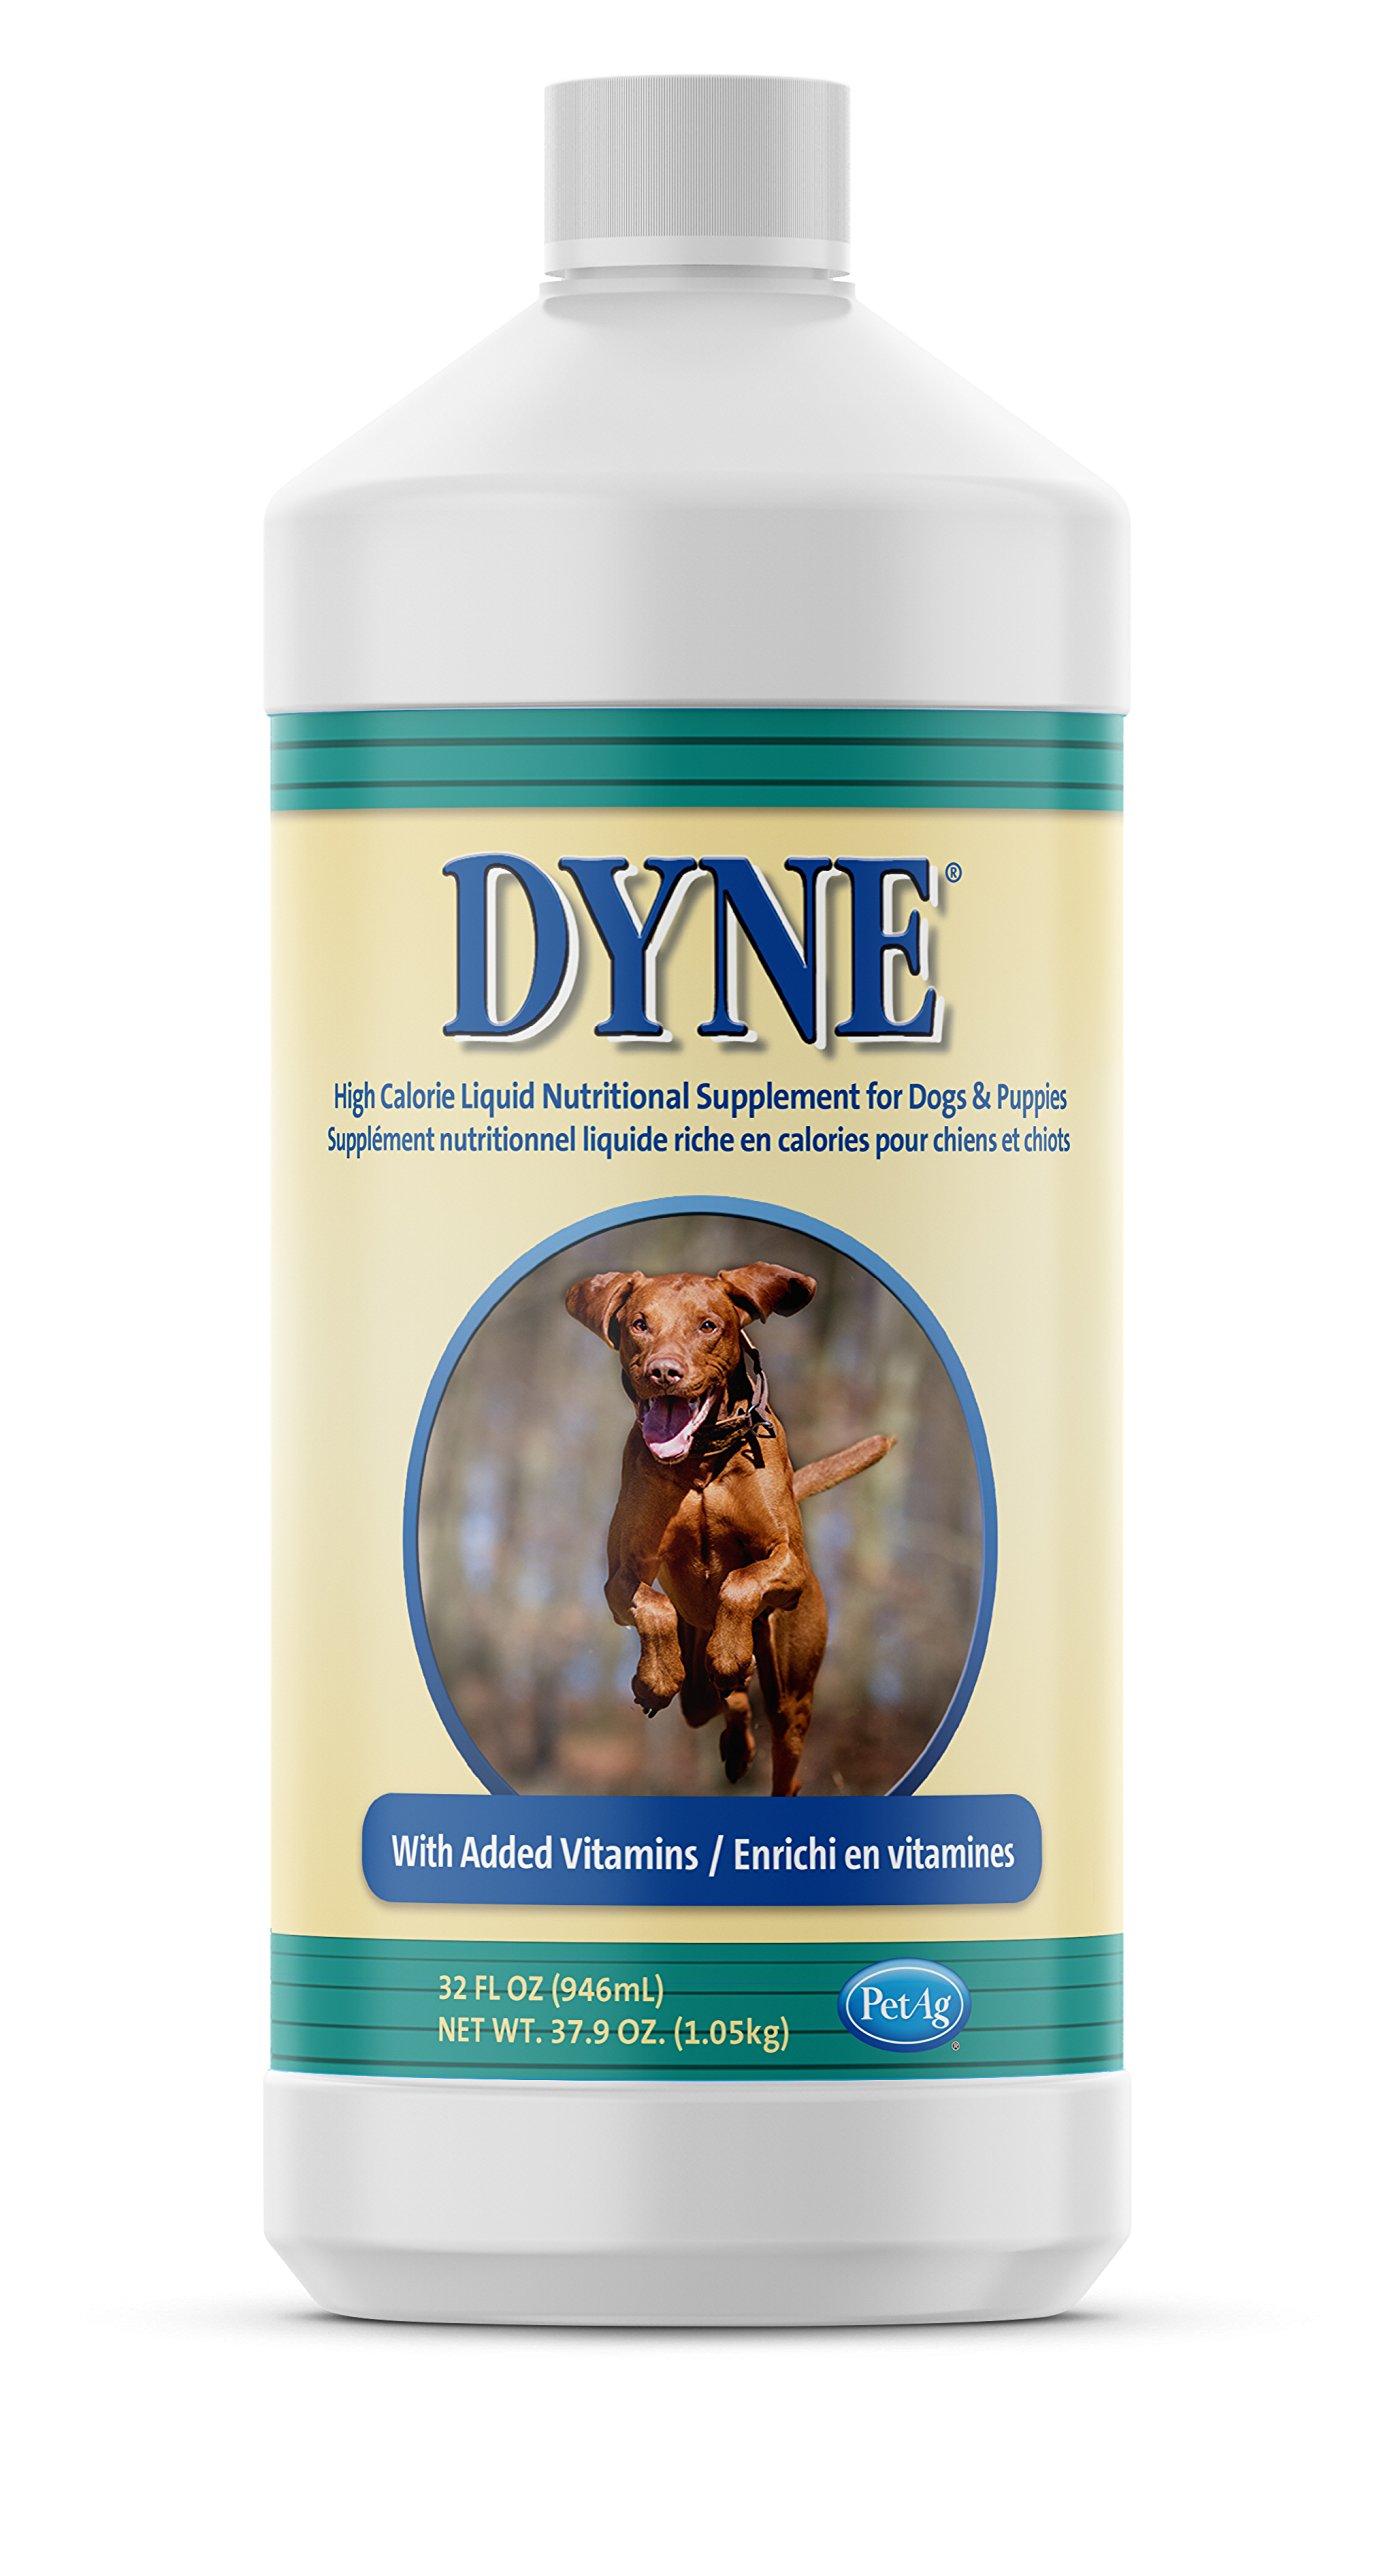 Dyne High Calorie Liquid for Dogs, 32 oz